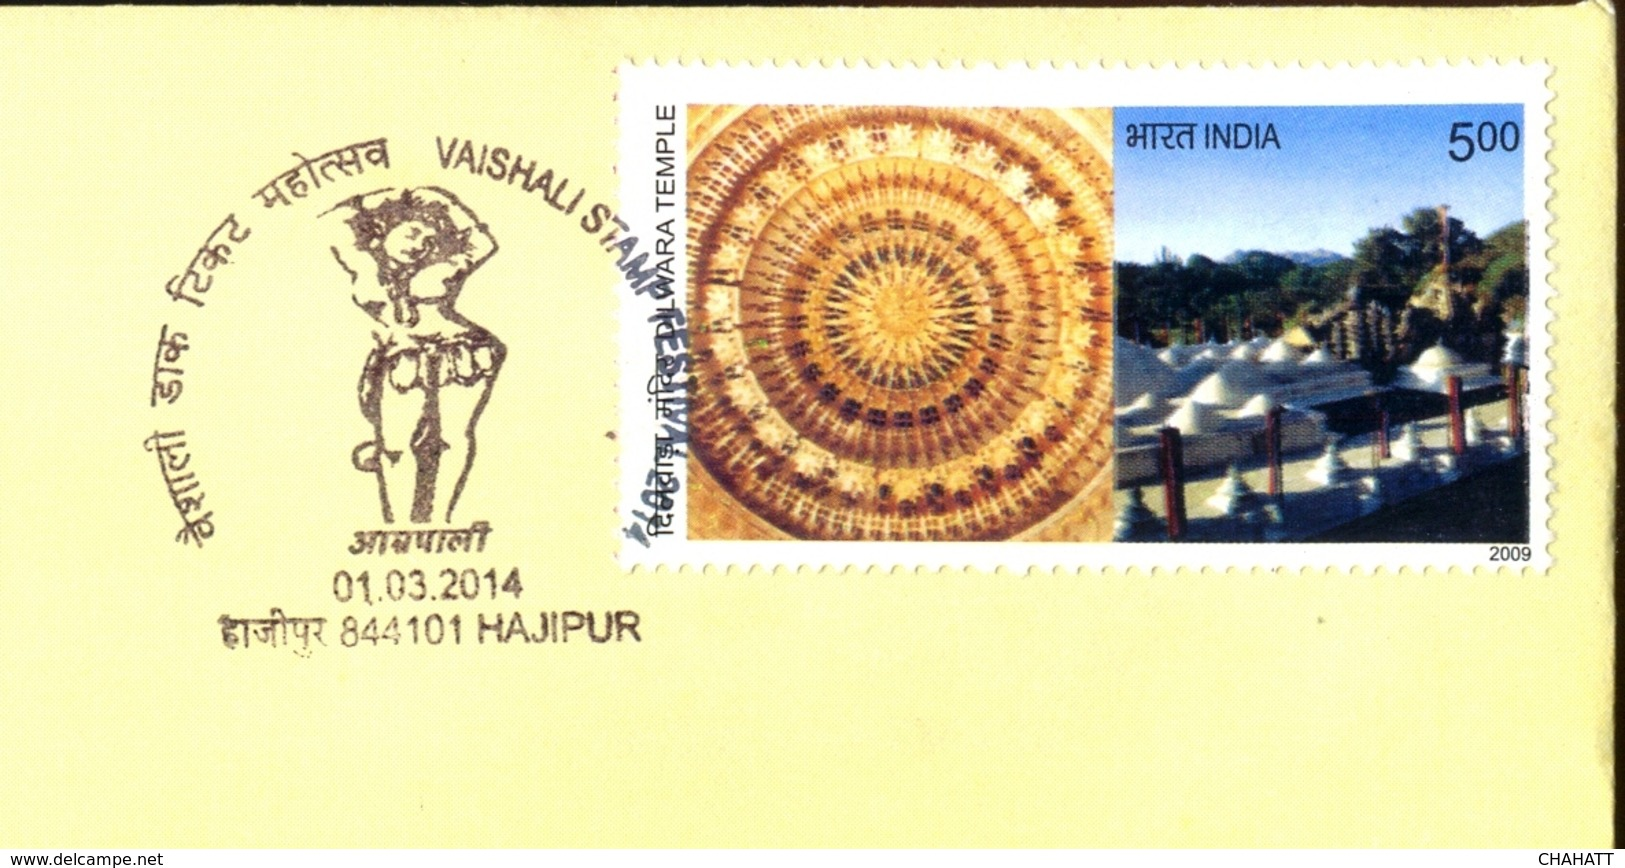 BUDDHISM-BUDDHA & AMRAPALI- DISCOURSES AT VAISHALI-SPECIAL COVER-INDIA-2014-BX1-393 - Buddhism